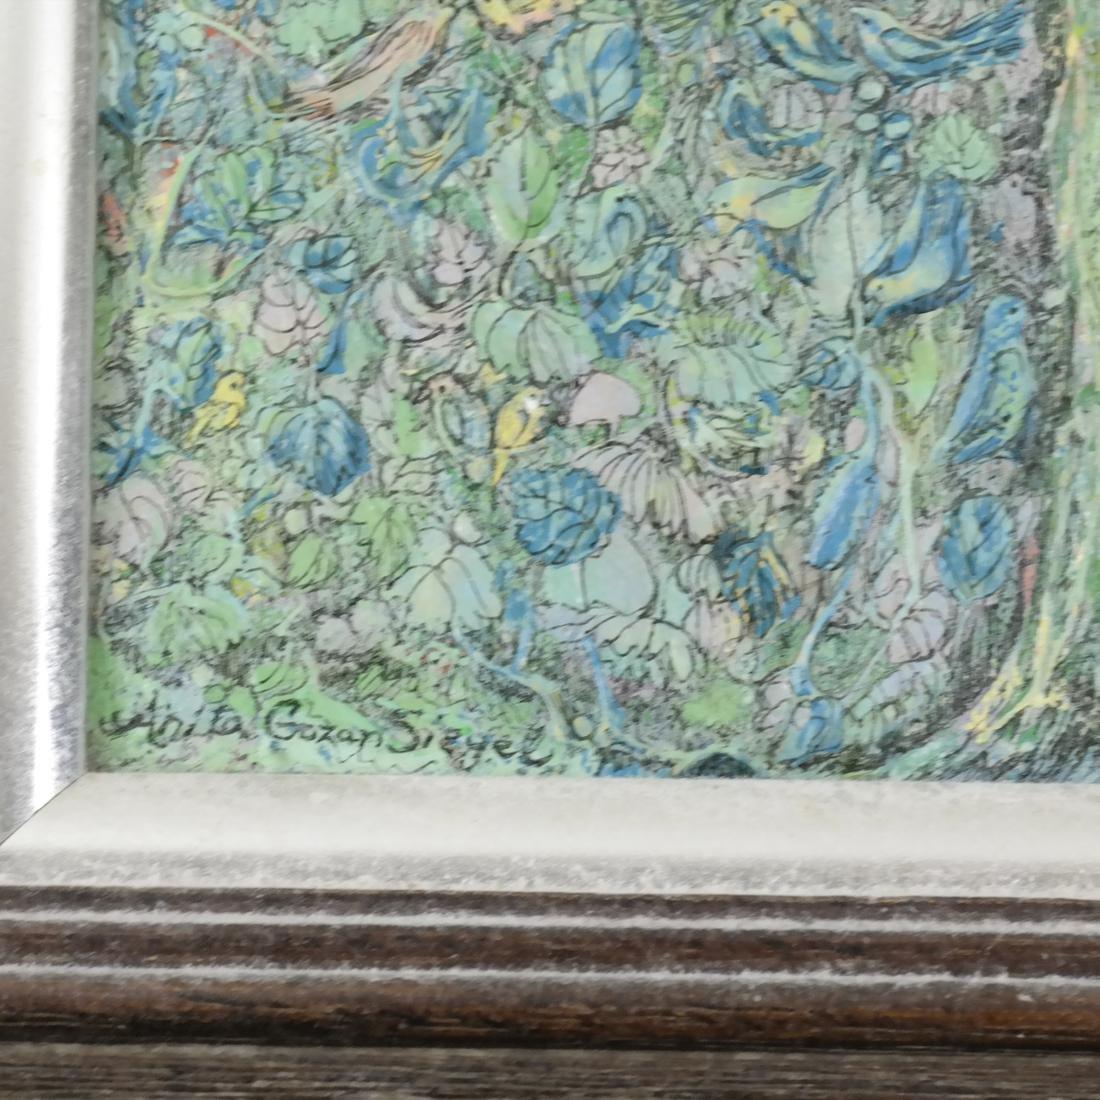 Anvita Gowzan Sieger, Trees - Acrylic - 3